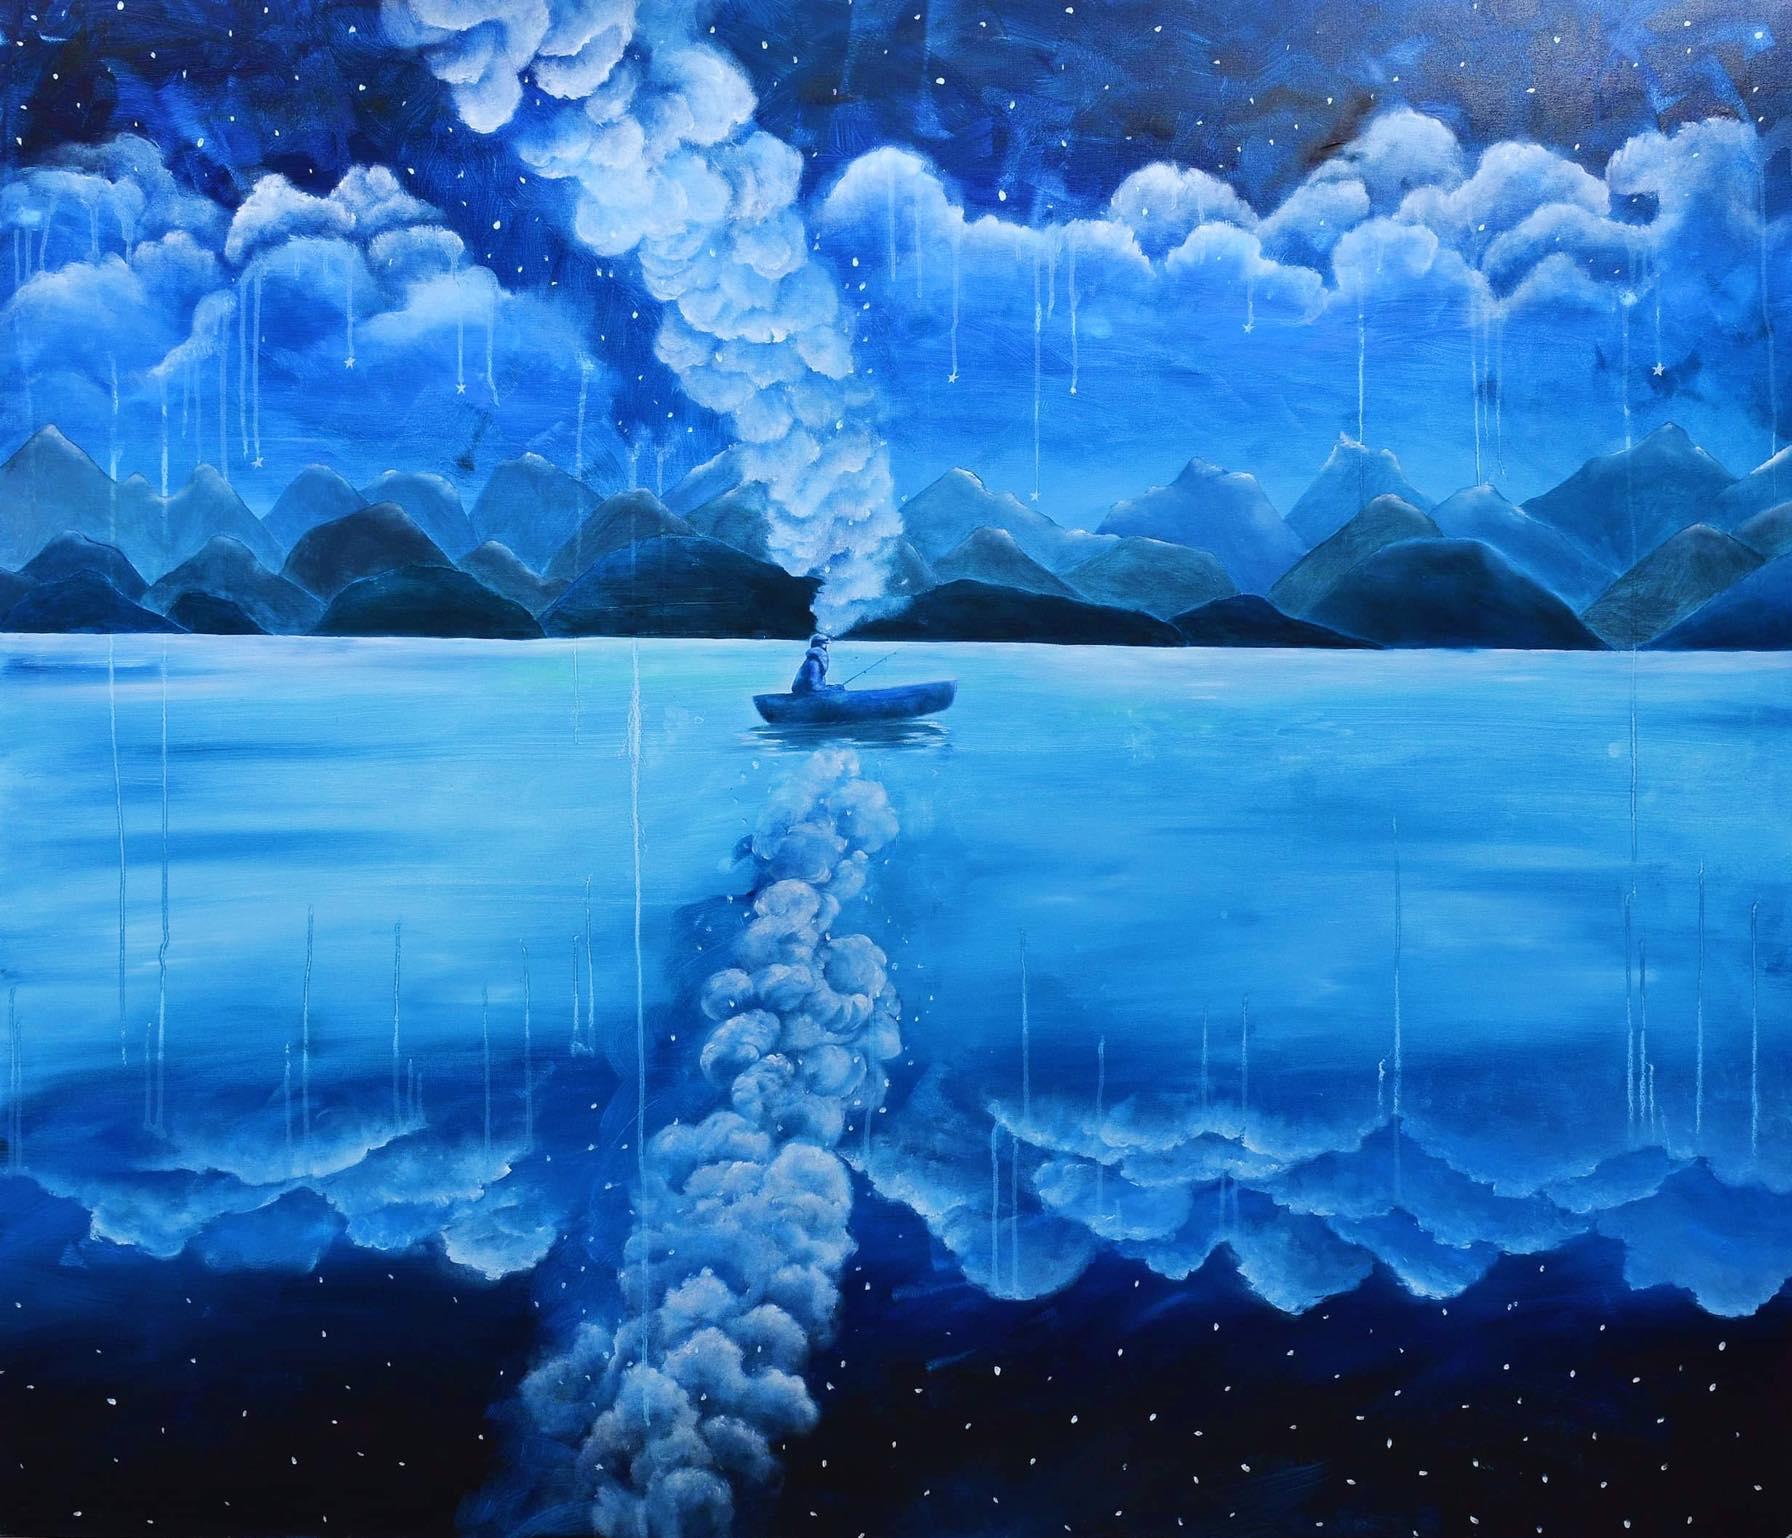 Nadeen El Rashidy, I'm On My Way, 2019, Oil on canvas, 150 x 150 cm.